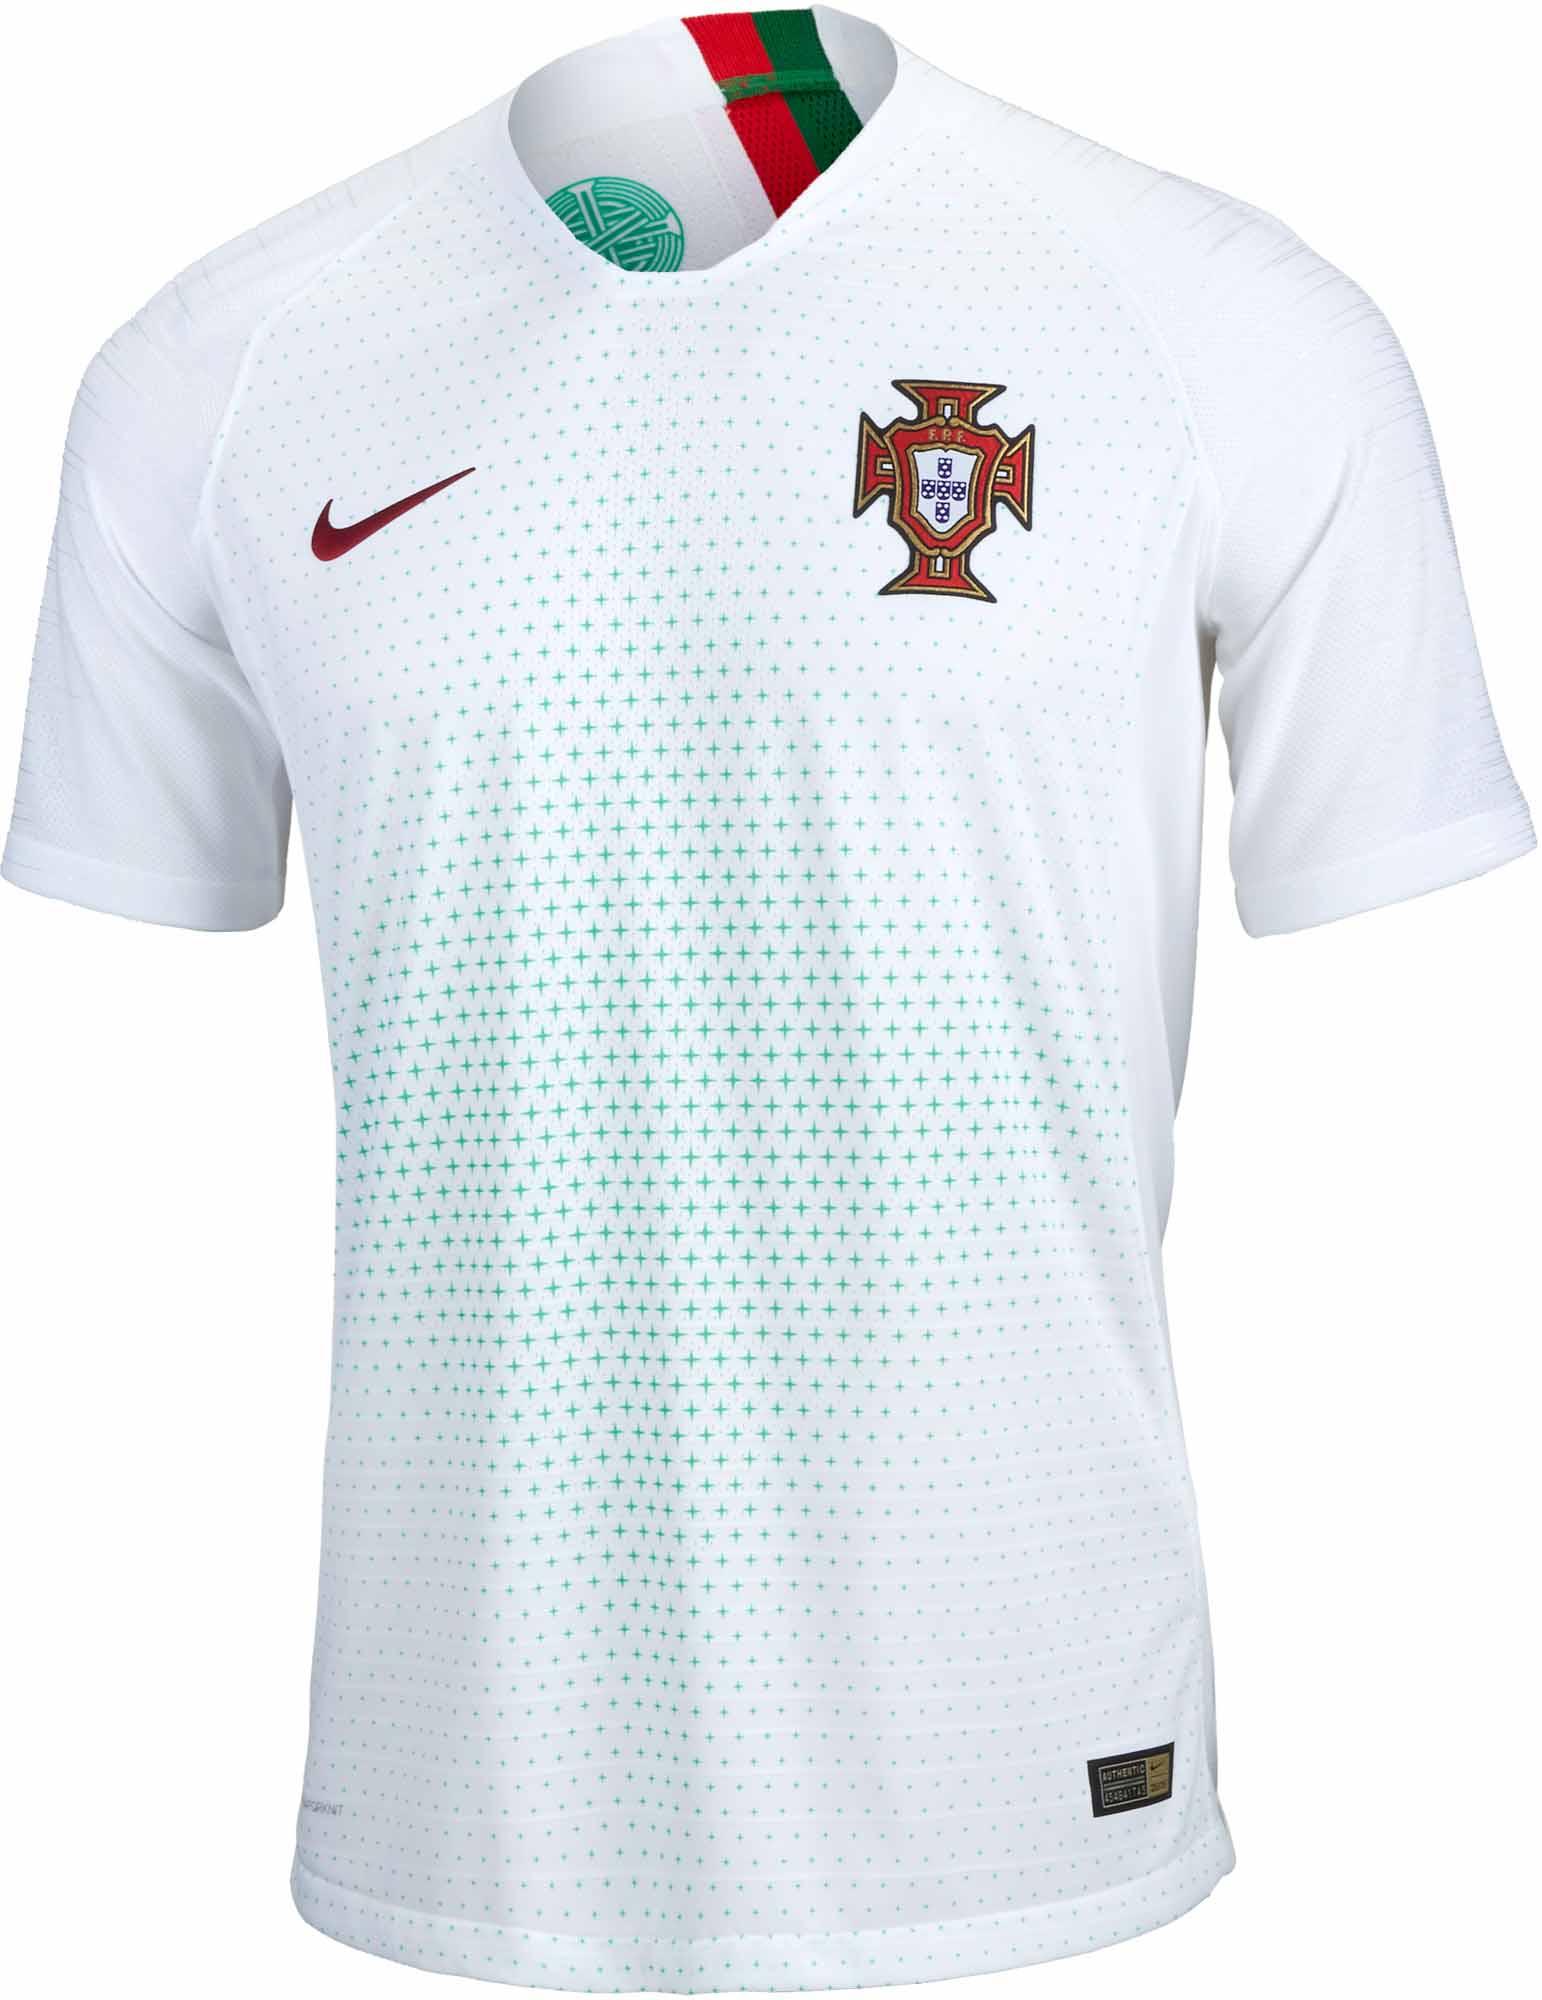 4d23f58d1 Nike Portugal Away Match Jersey 2018-19 - SoccerPro